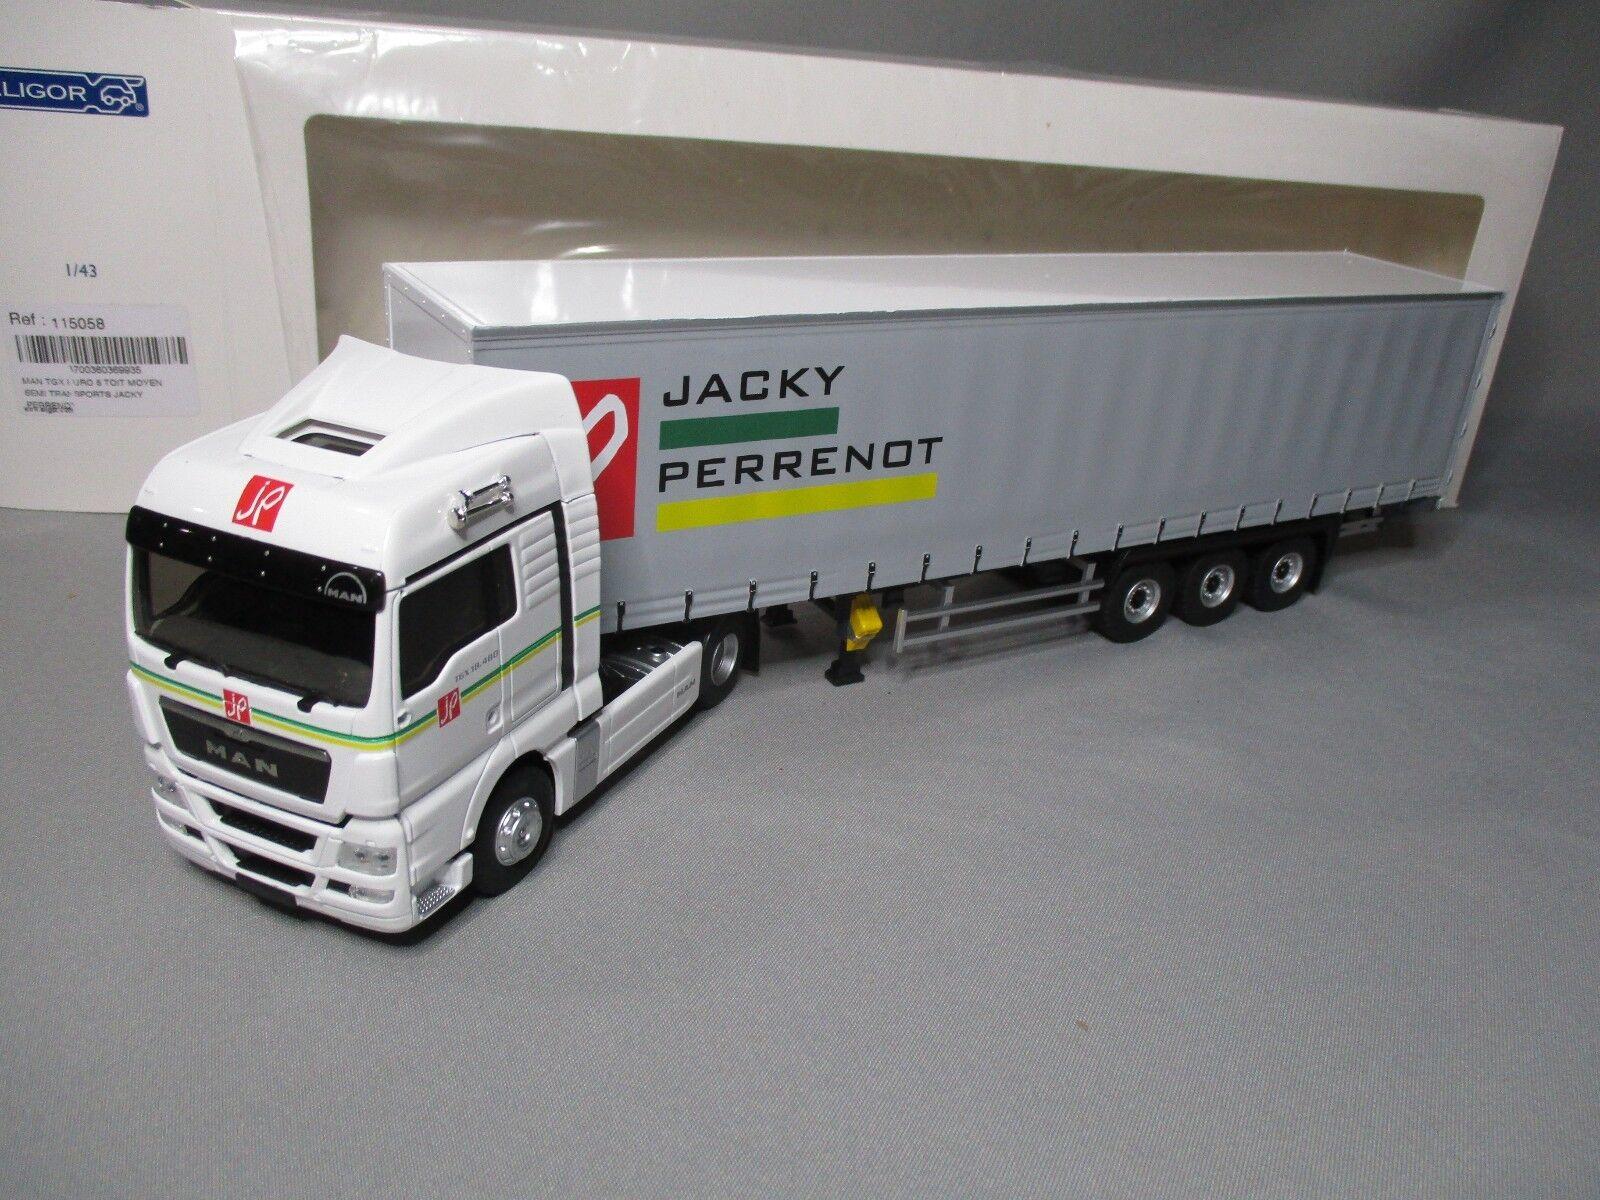 DV7755 ELIGOR 1 43 MAN TGX EURO S TAUTLINER TRANSPORTS JACKY PERRENOT 115058